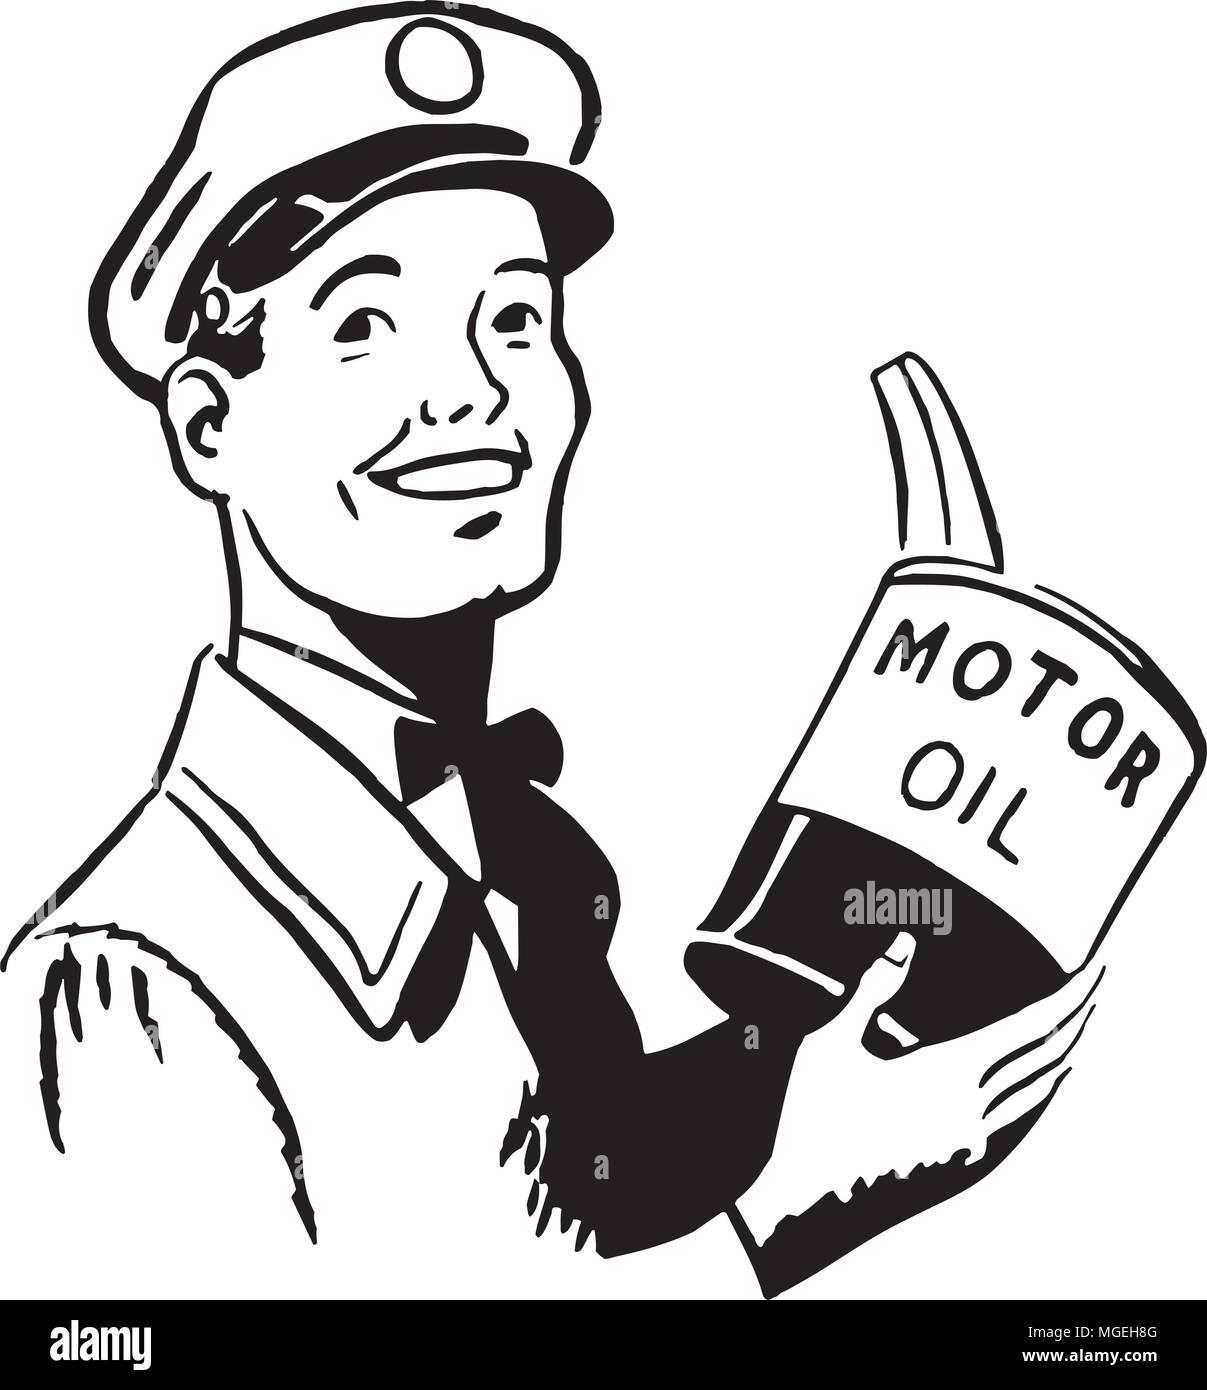 Serviceman With Motor Oil - Retro Clipart Illustration - Stock Vector